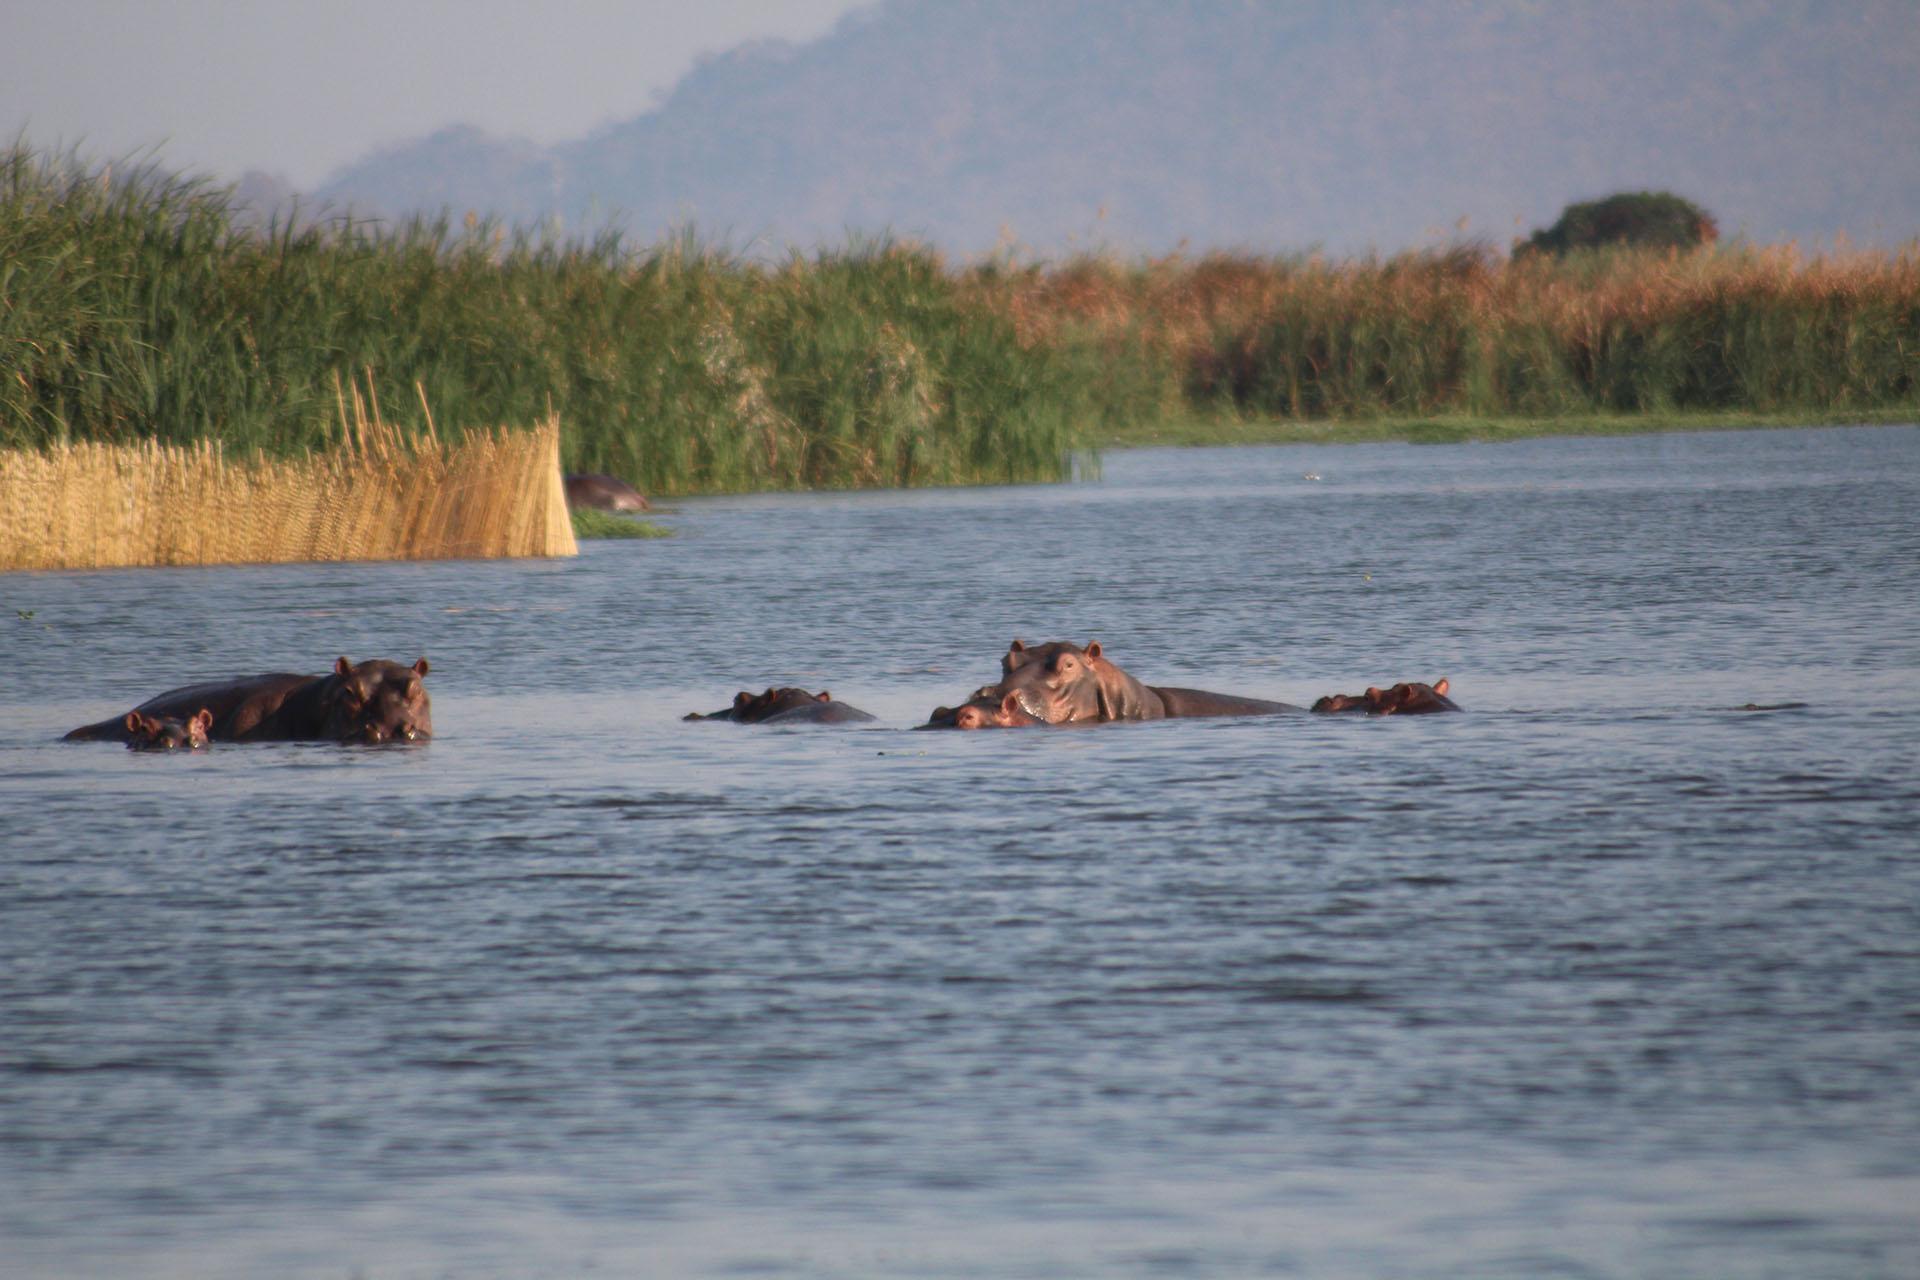 malawi zambia off-season-safari-malawian-style-malawi-adventures-experiences-specialist-tour-operator-tours-kumbali-lake-retreat-hippos